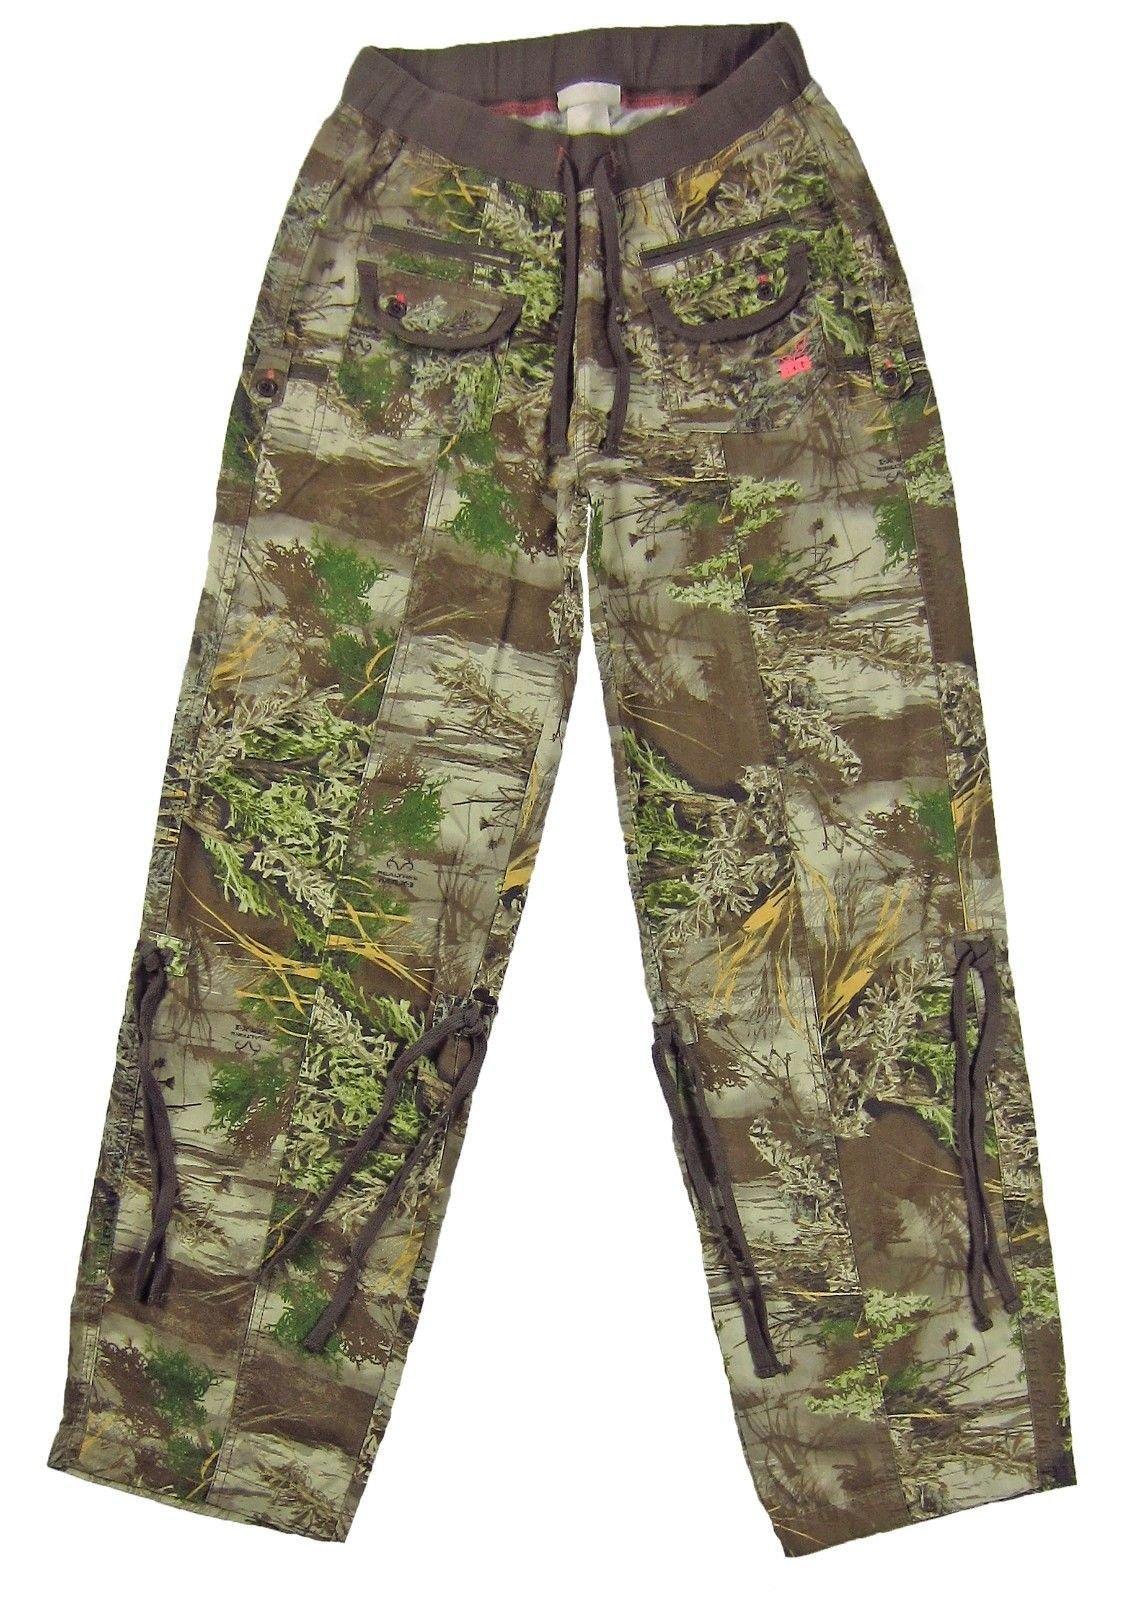 Nwt Realtree Girl Sage Pant Max 1 Camo Camouflage Pants